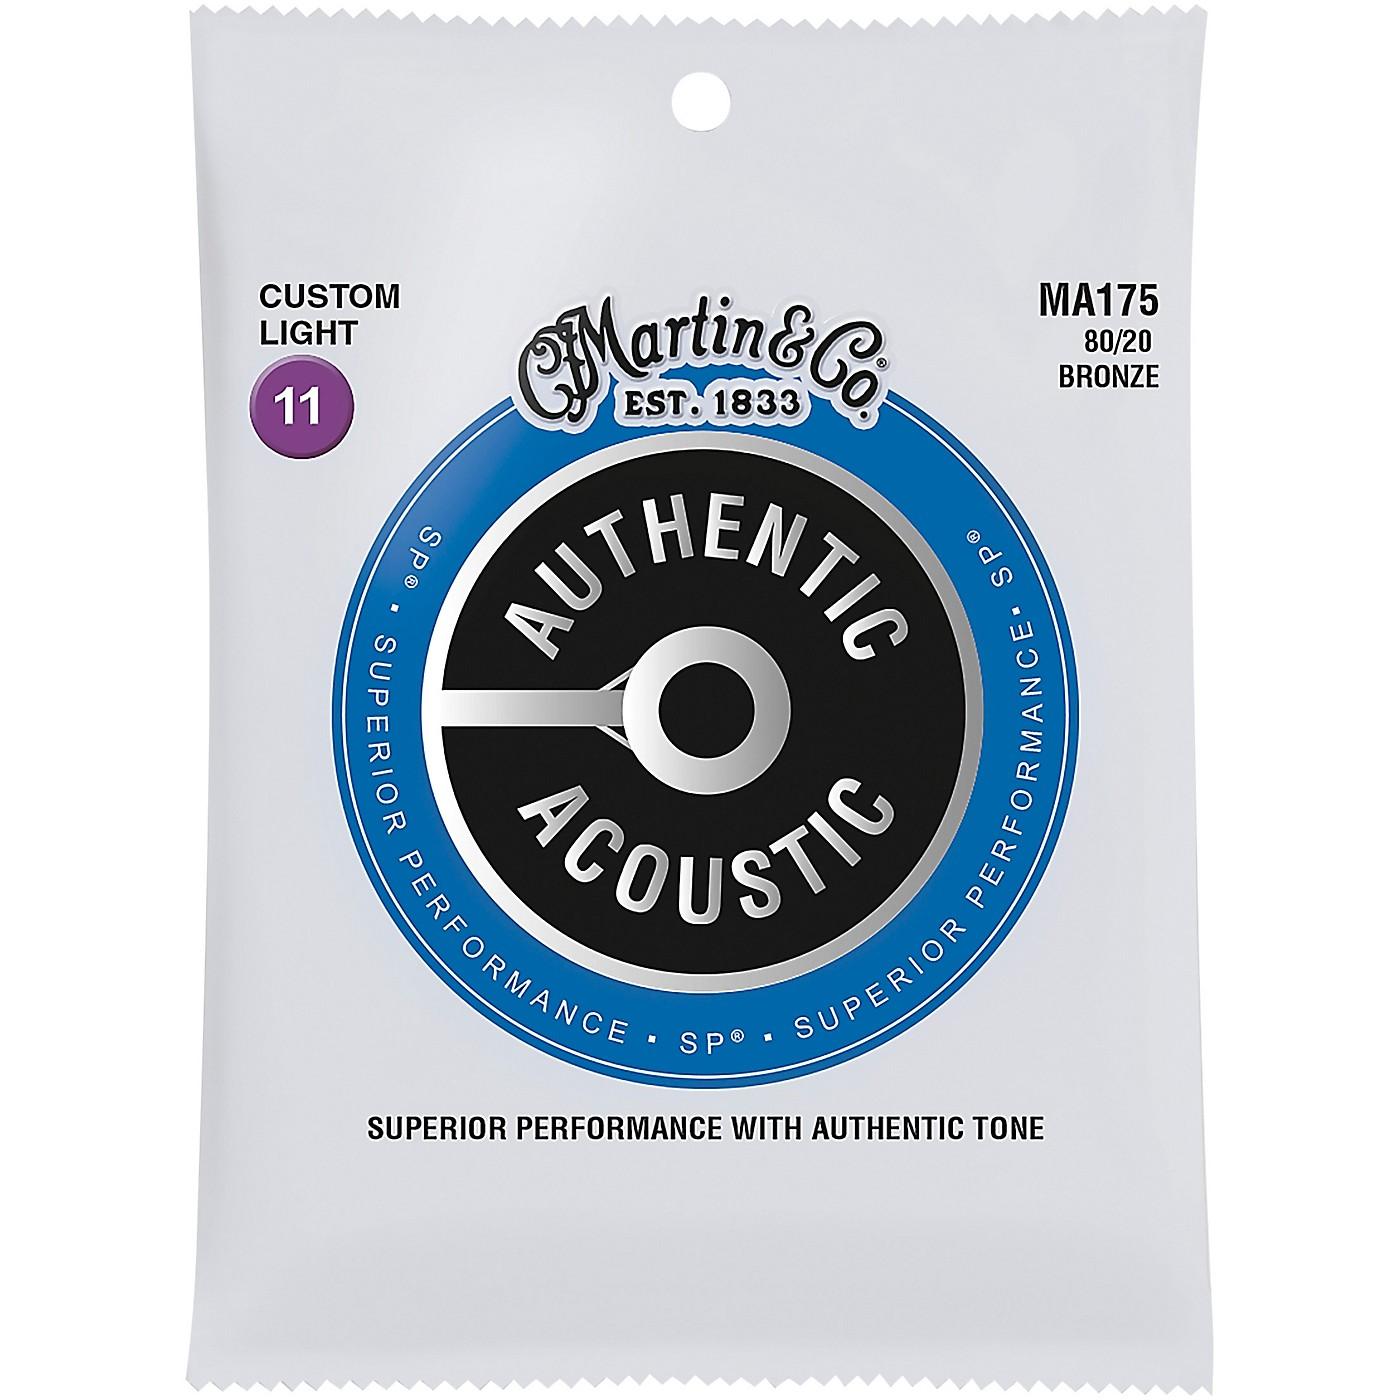 Martin MA175 SP 80/20 Bronze Custom-Light Authentic Acoustic Guitar Strings thumbnail